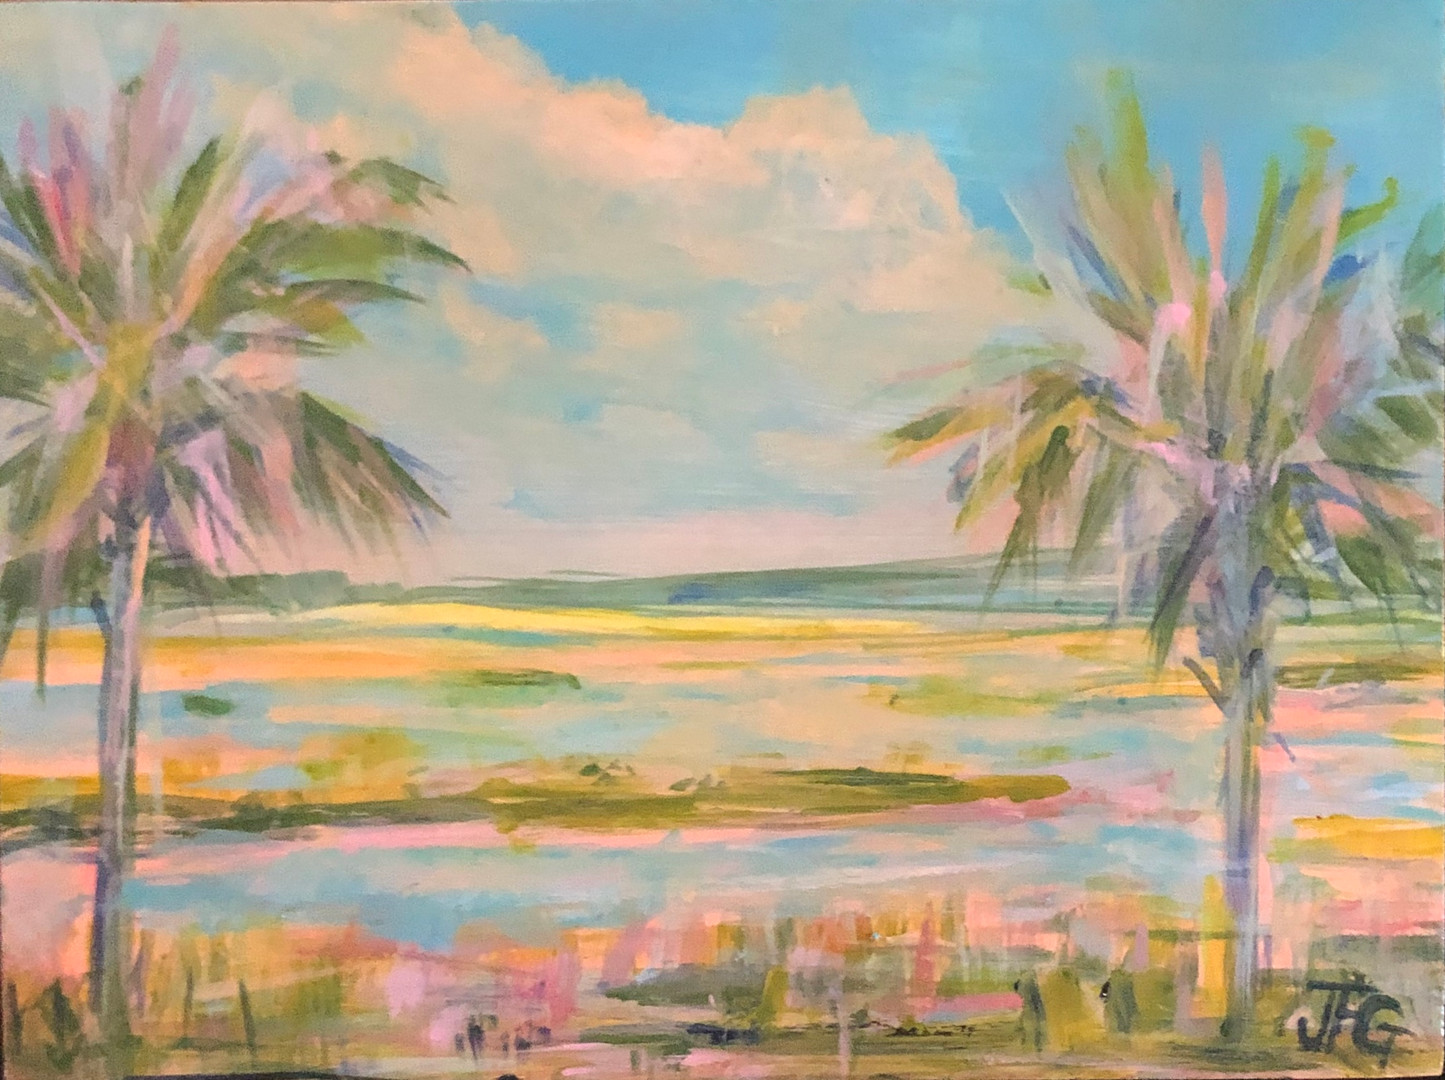 Eternal Summer by Julia Fellers-Green